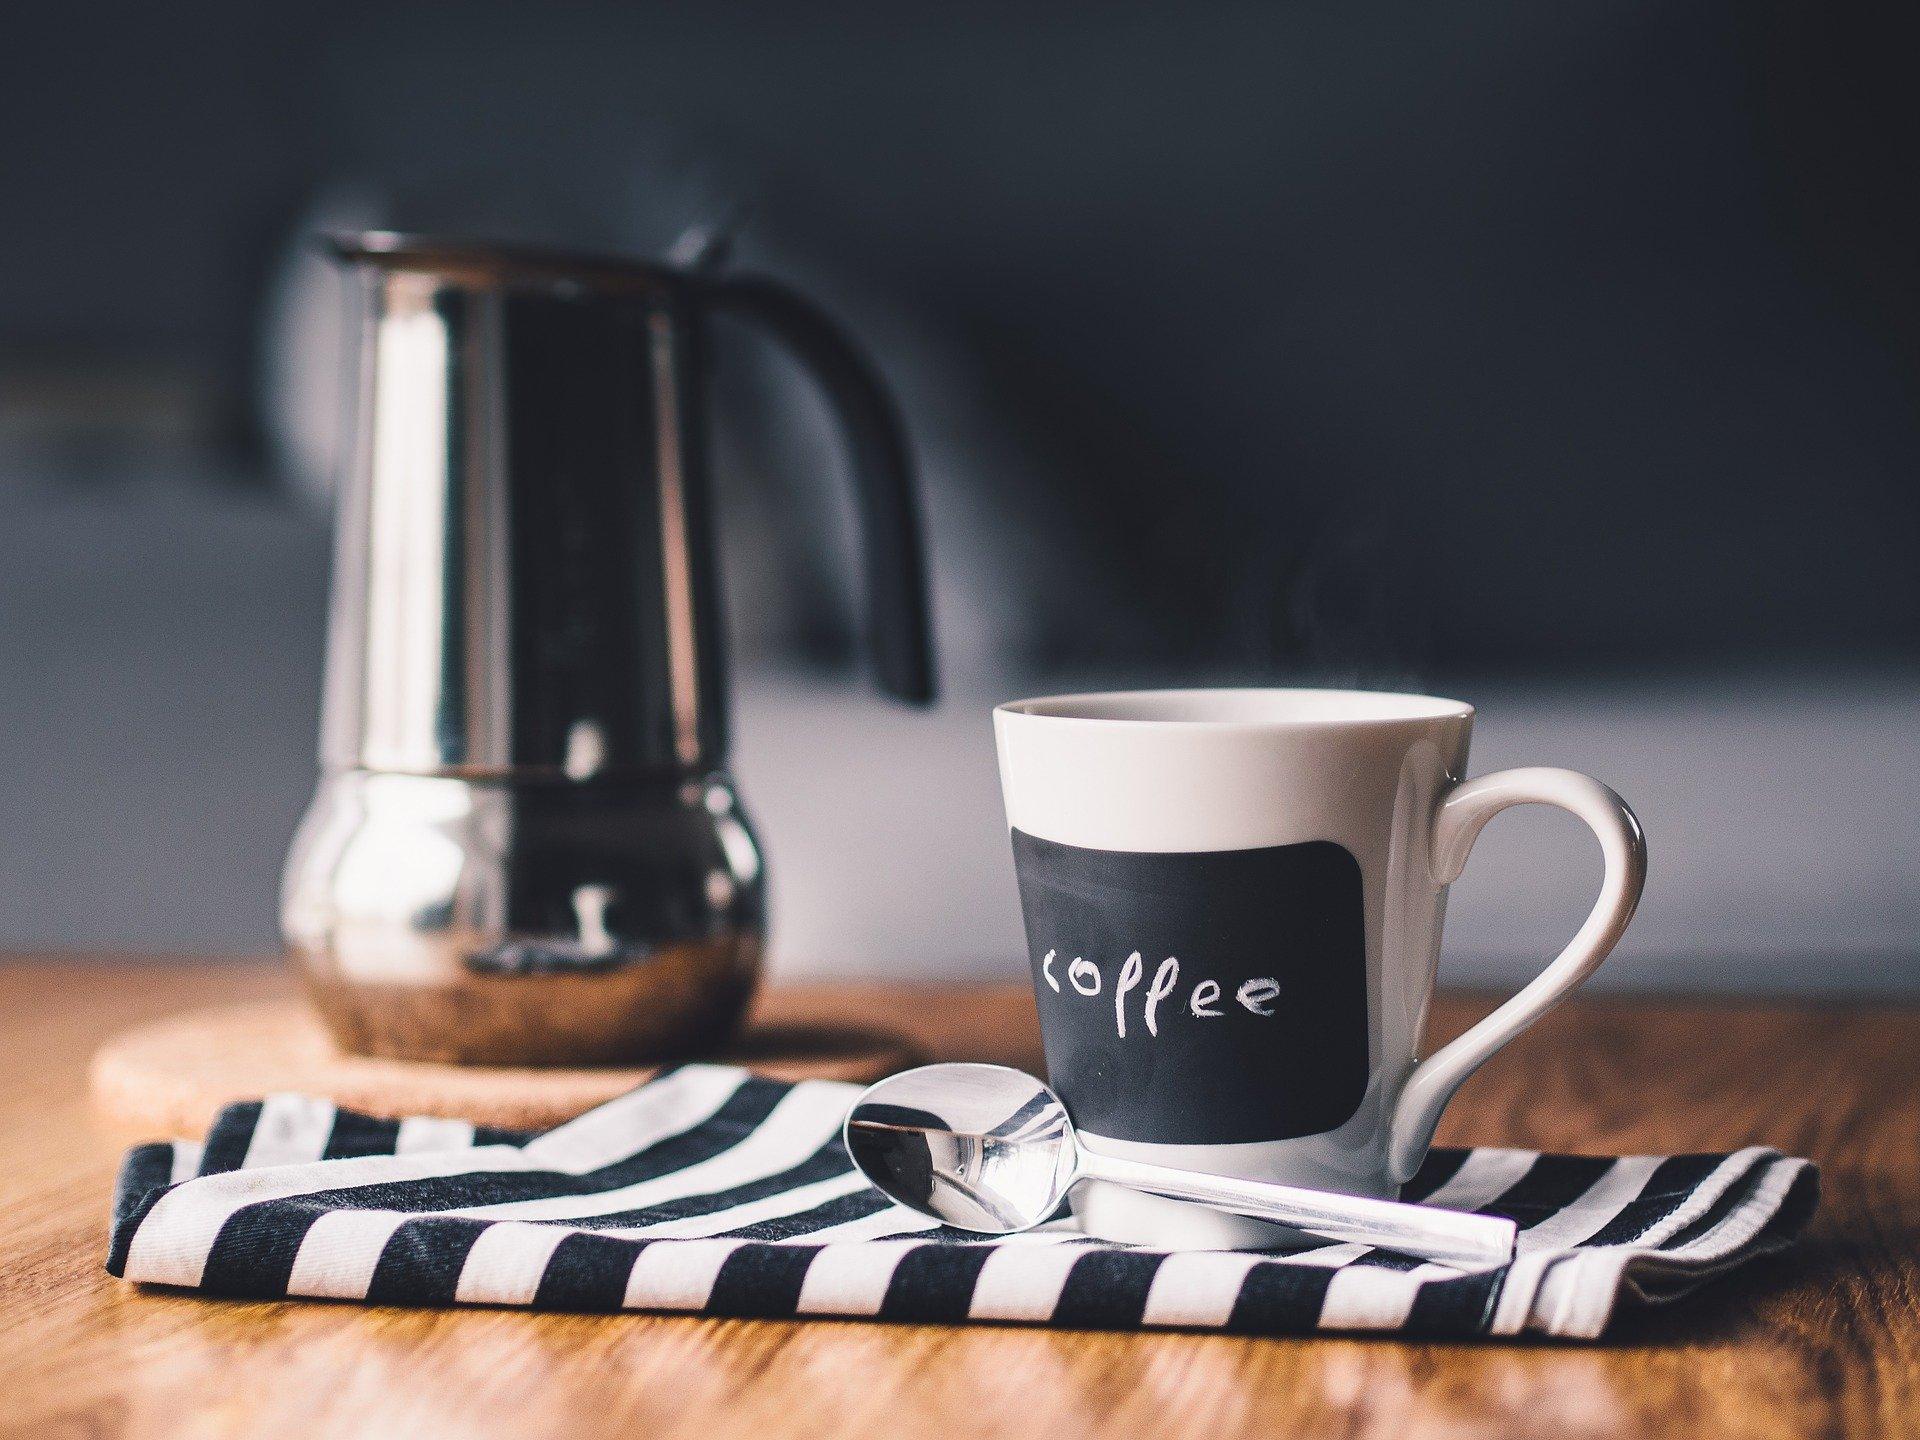 por-la-manana-cafe-copa.jpg